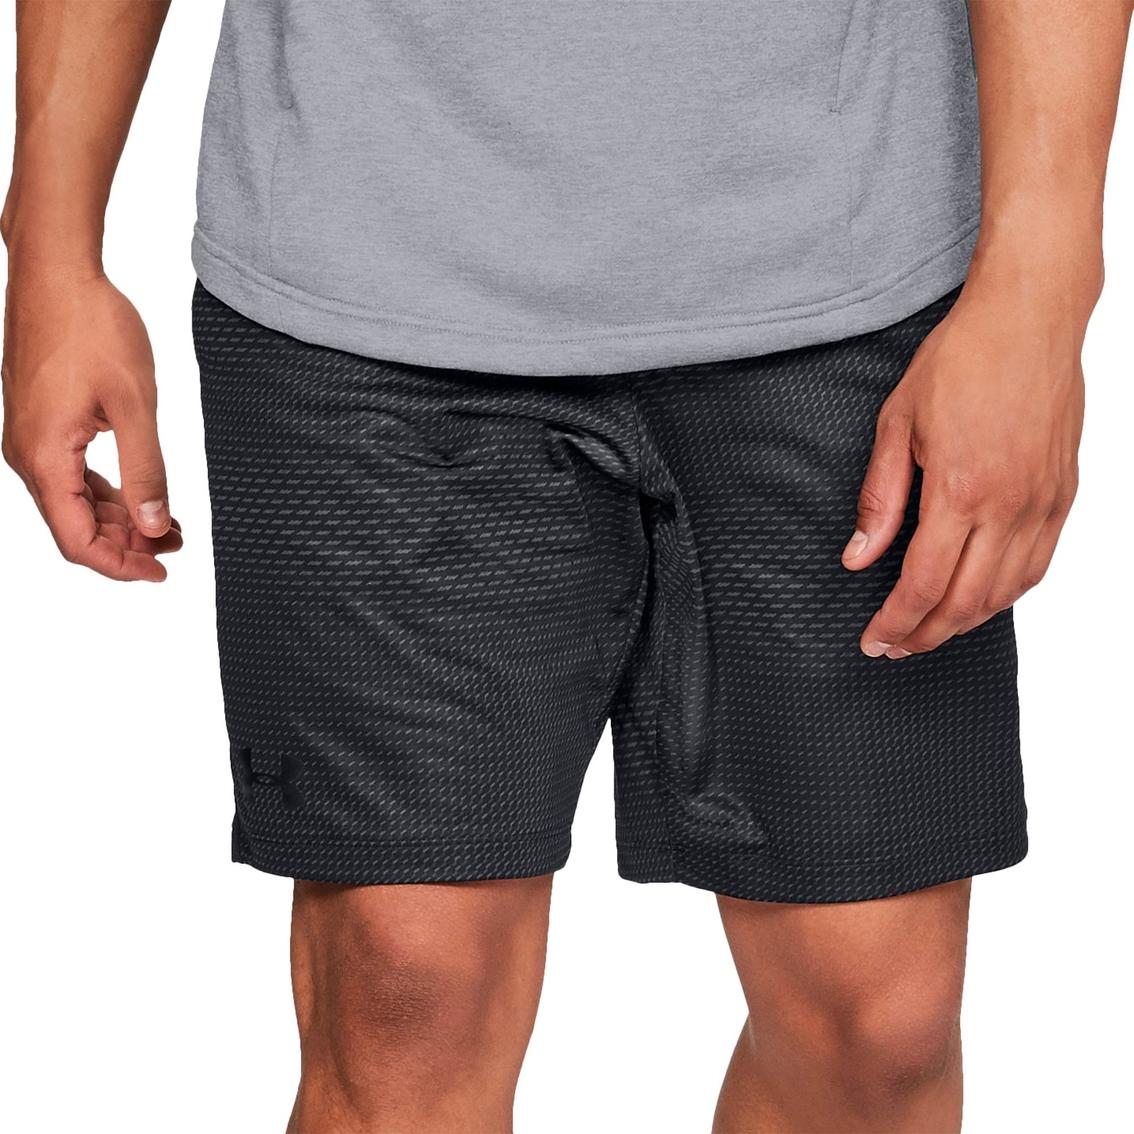 bordillo Robusto relajado  Under Armour Mk1 Printed Shorts | Shorts | Clothing & Accessories | Shop  The Exchange